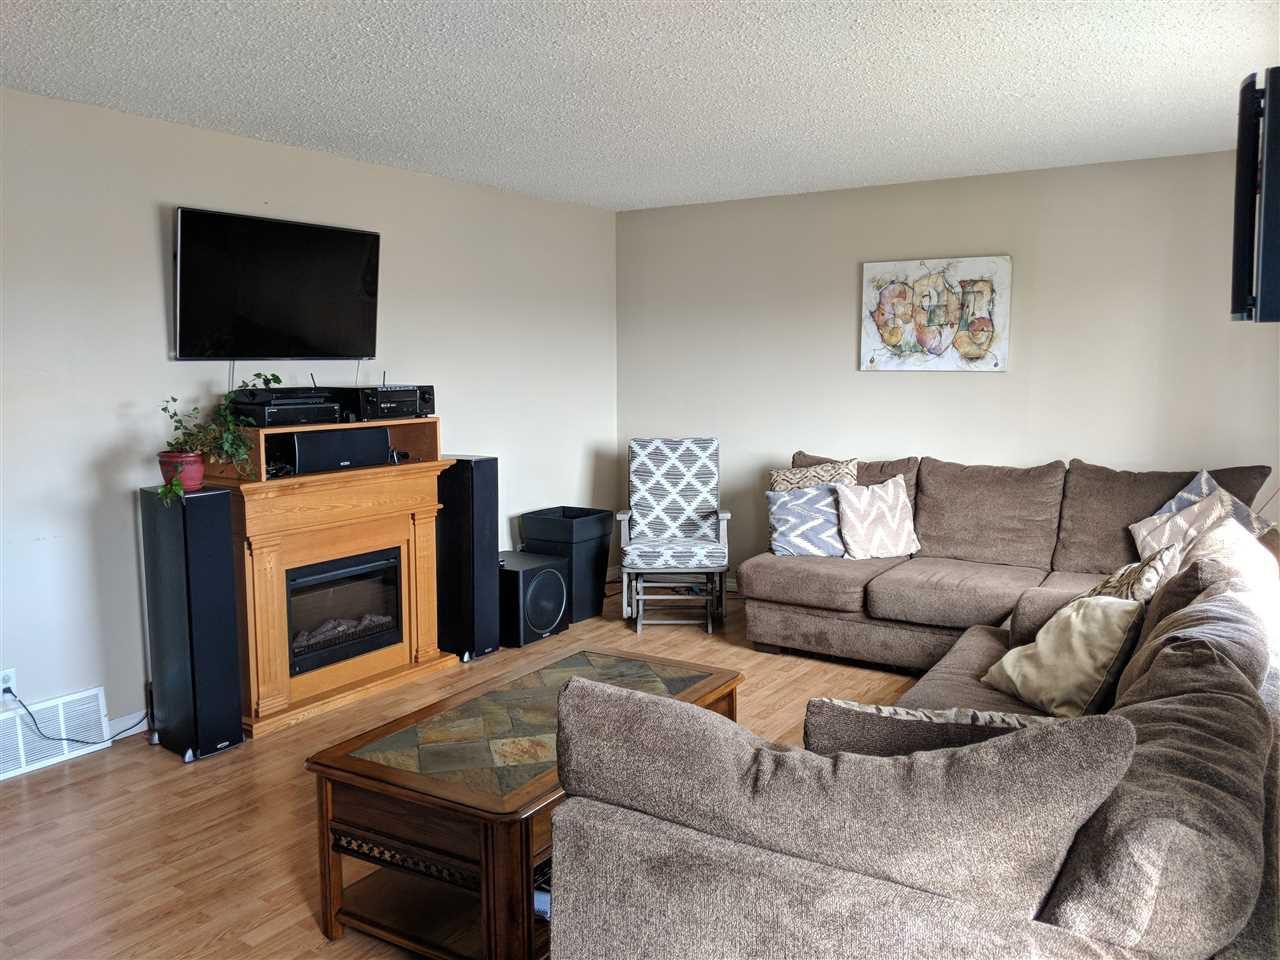 Photo 5: Photos: 4740 48 Street S: Clyde House for sale : MLS®# E4152983